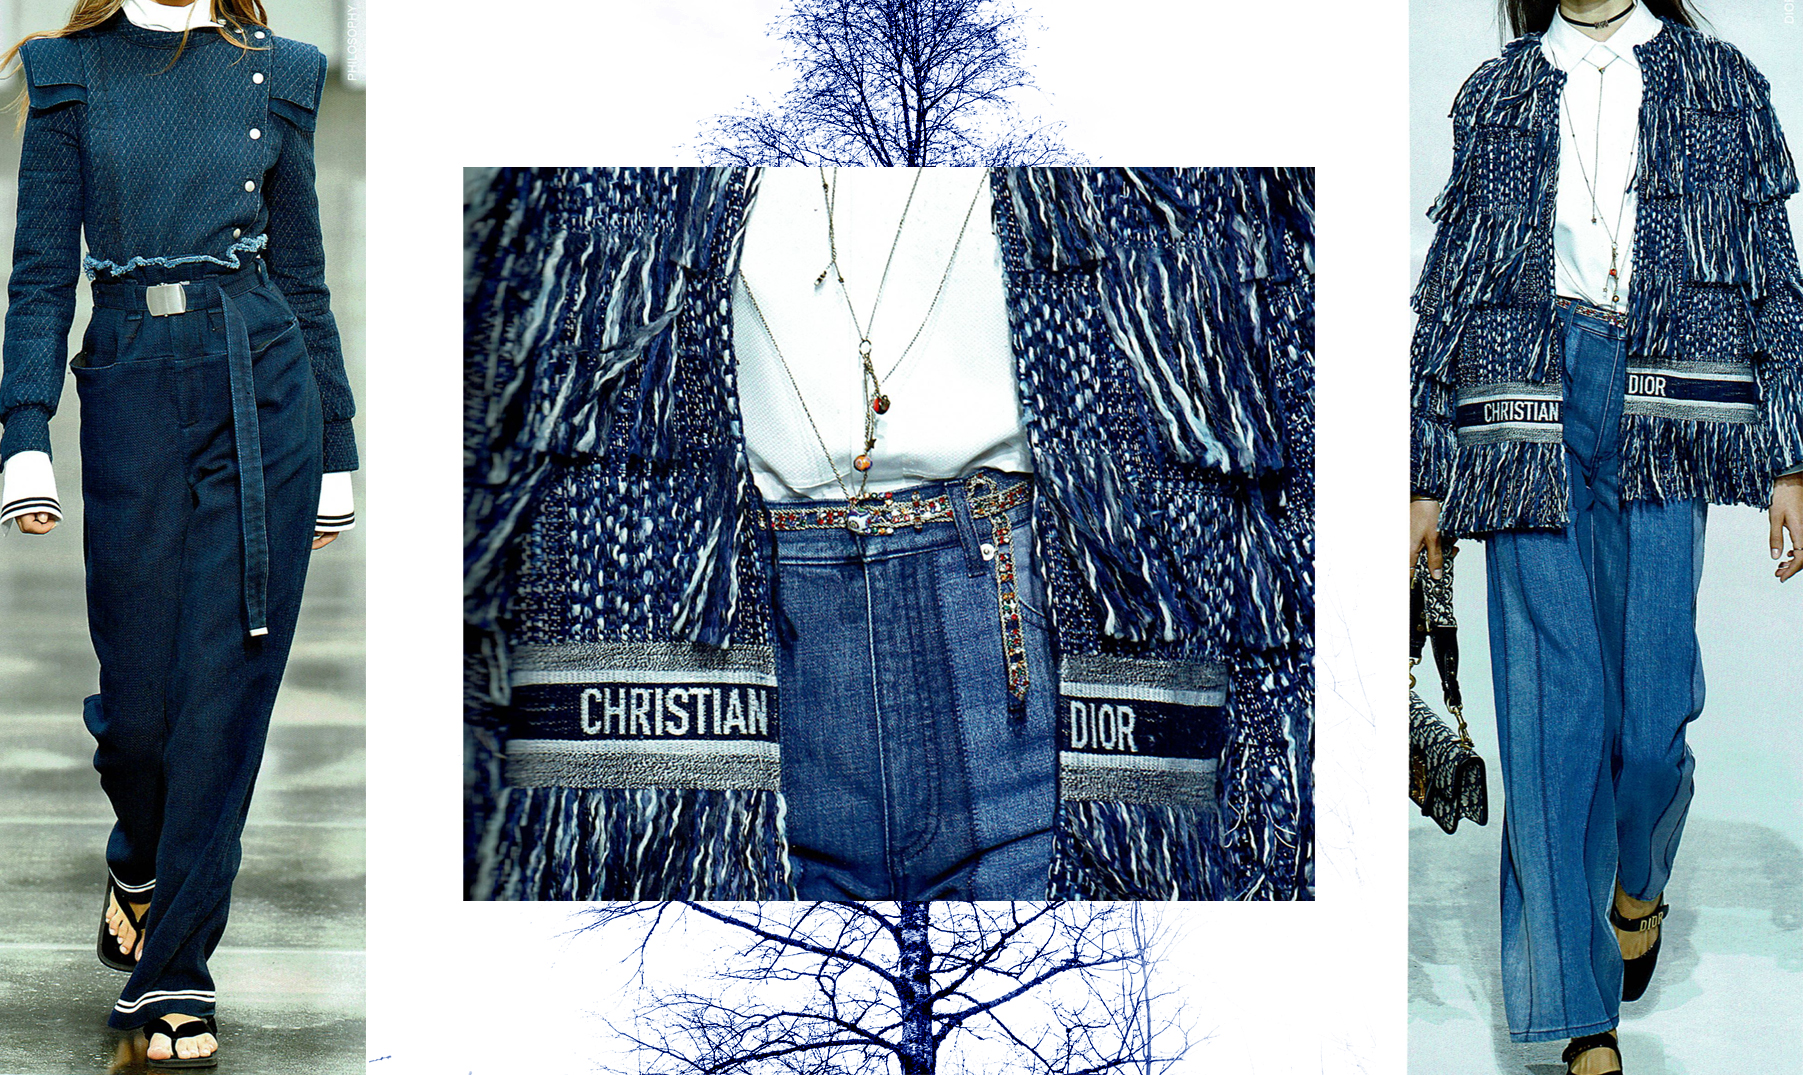 Designer: Christian Dior